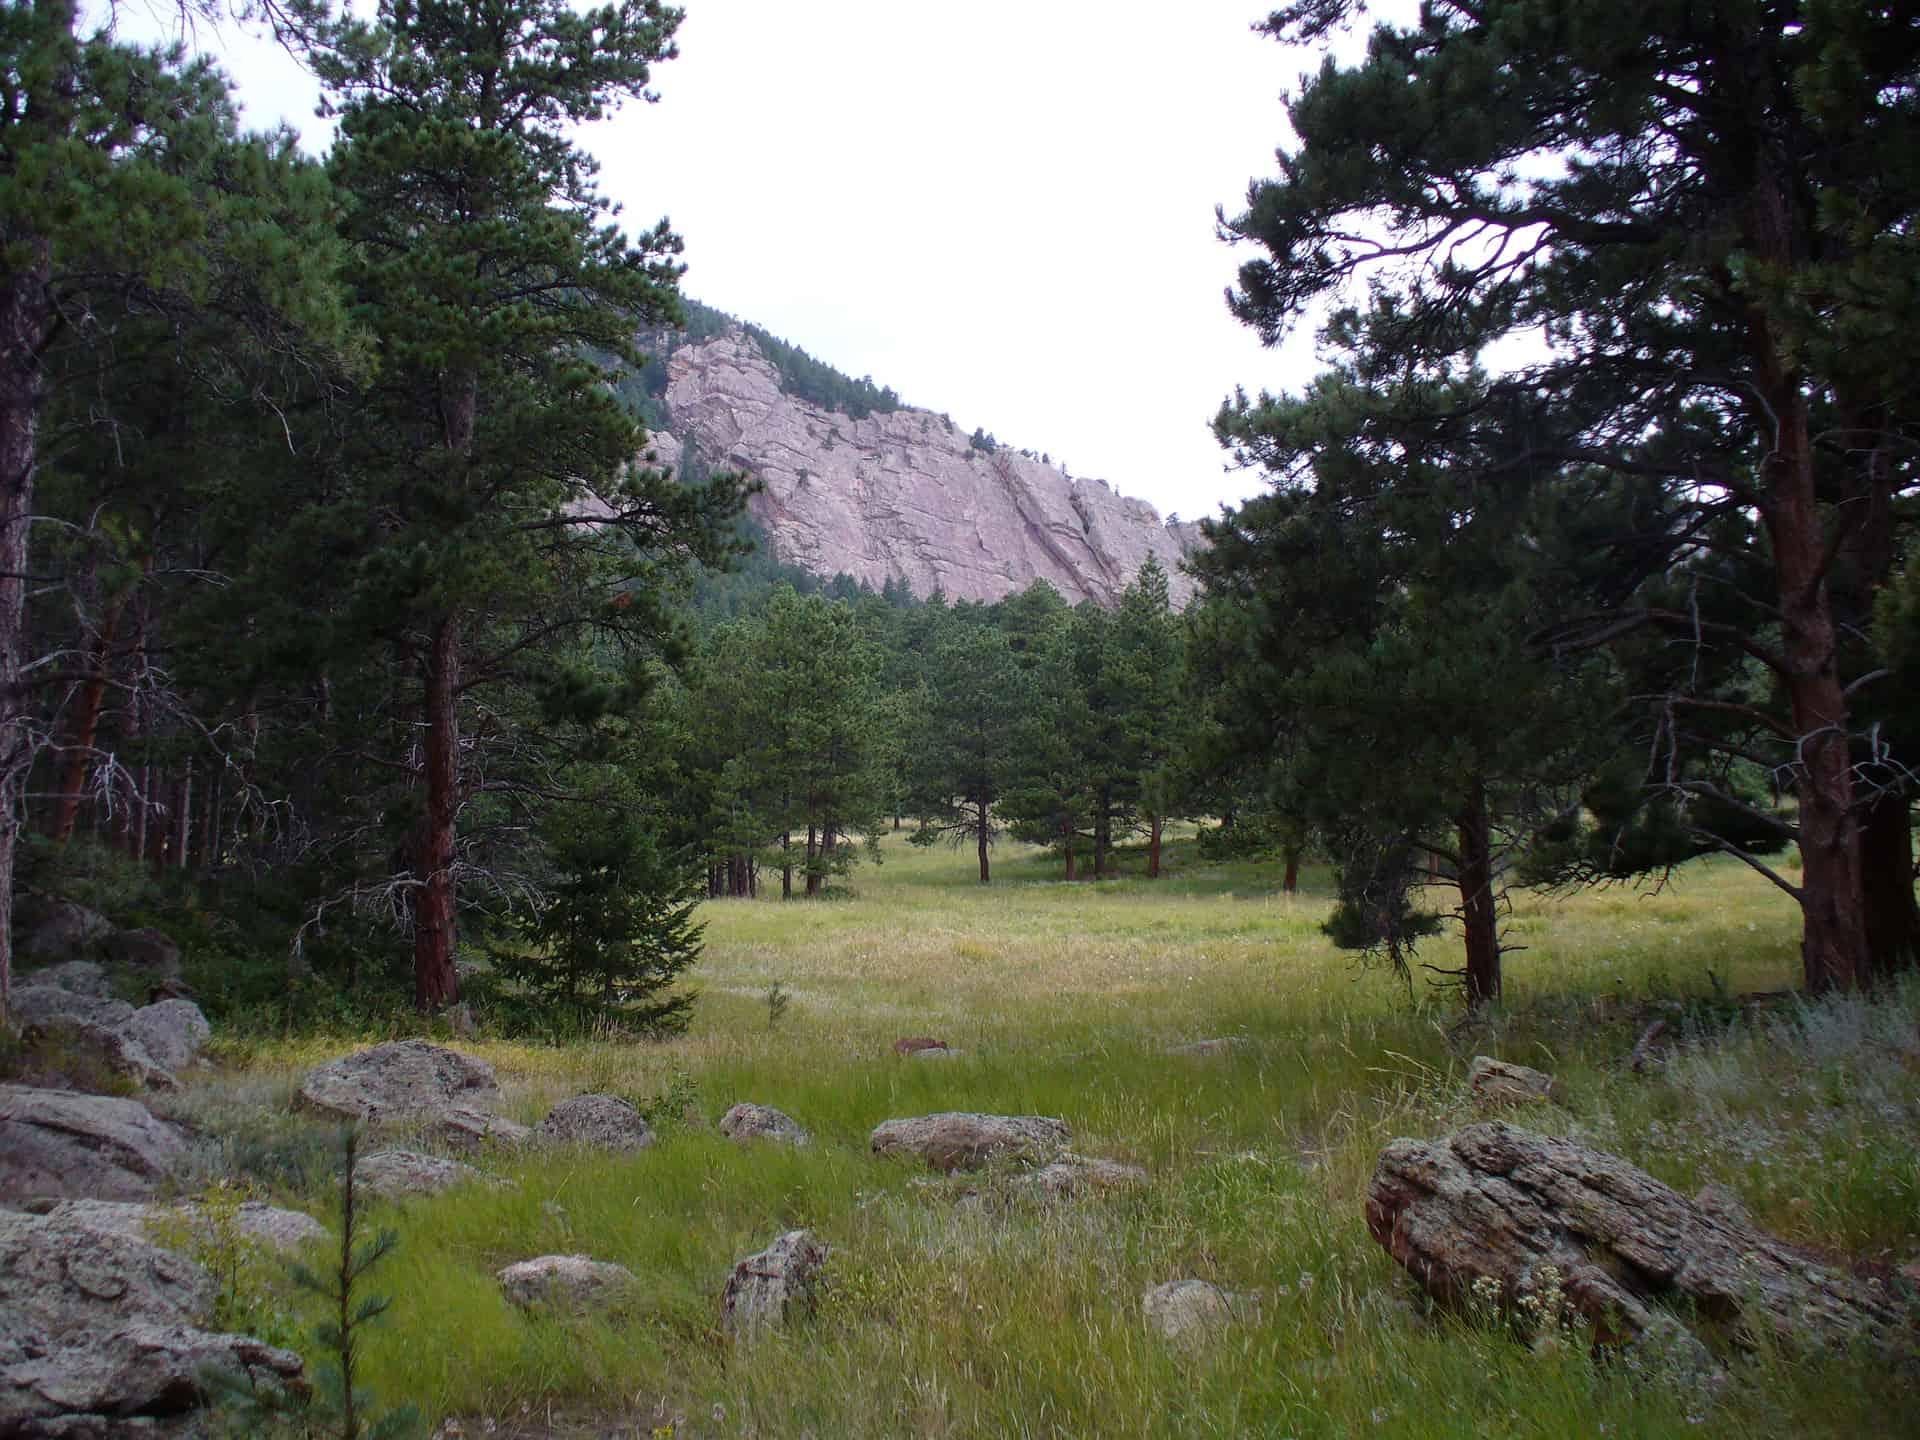 red rock of shanahan ridge flatirons area outside of boulder colorado